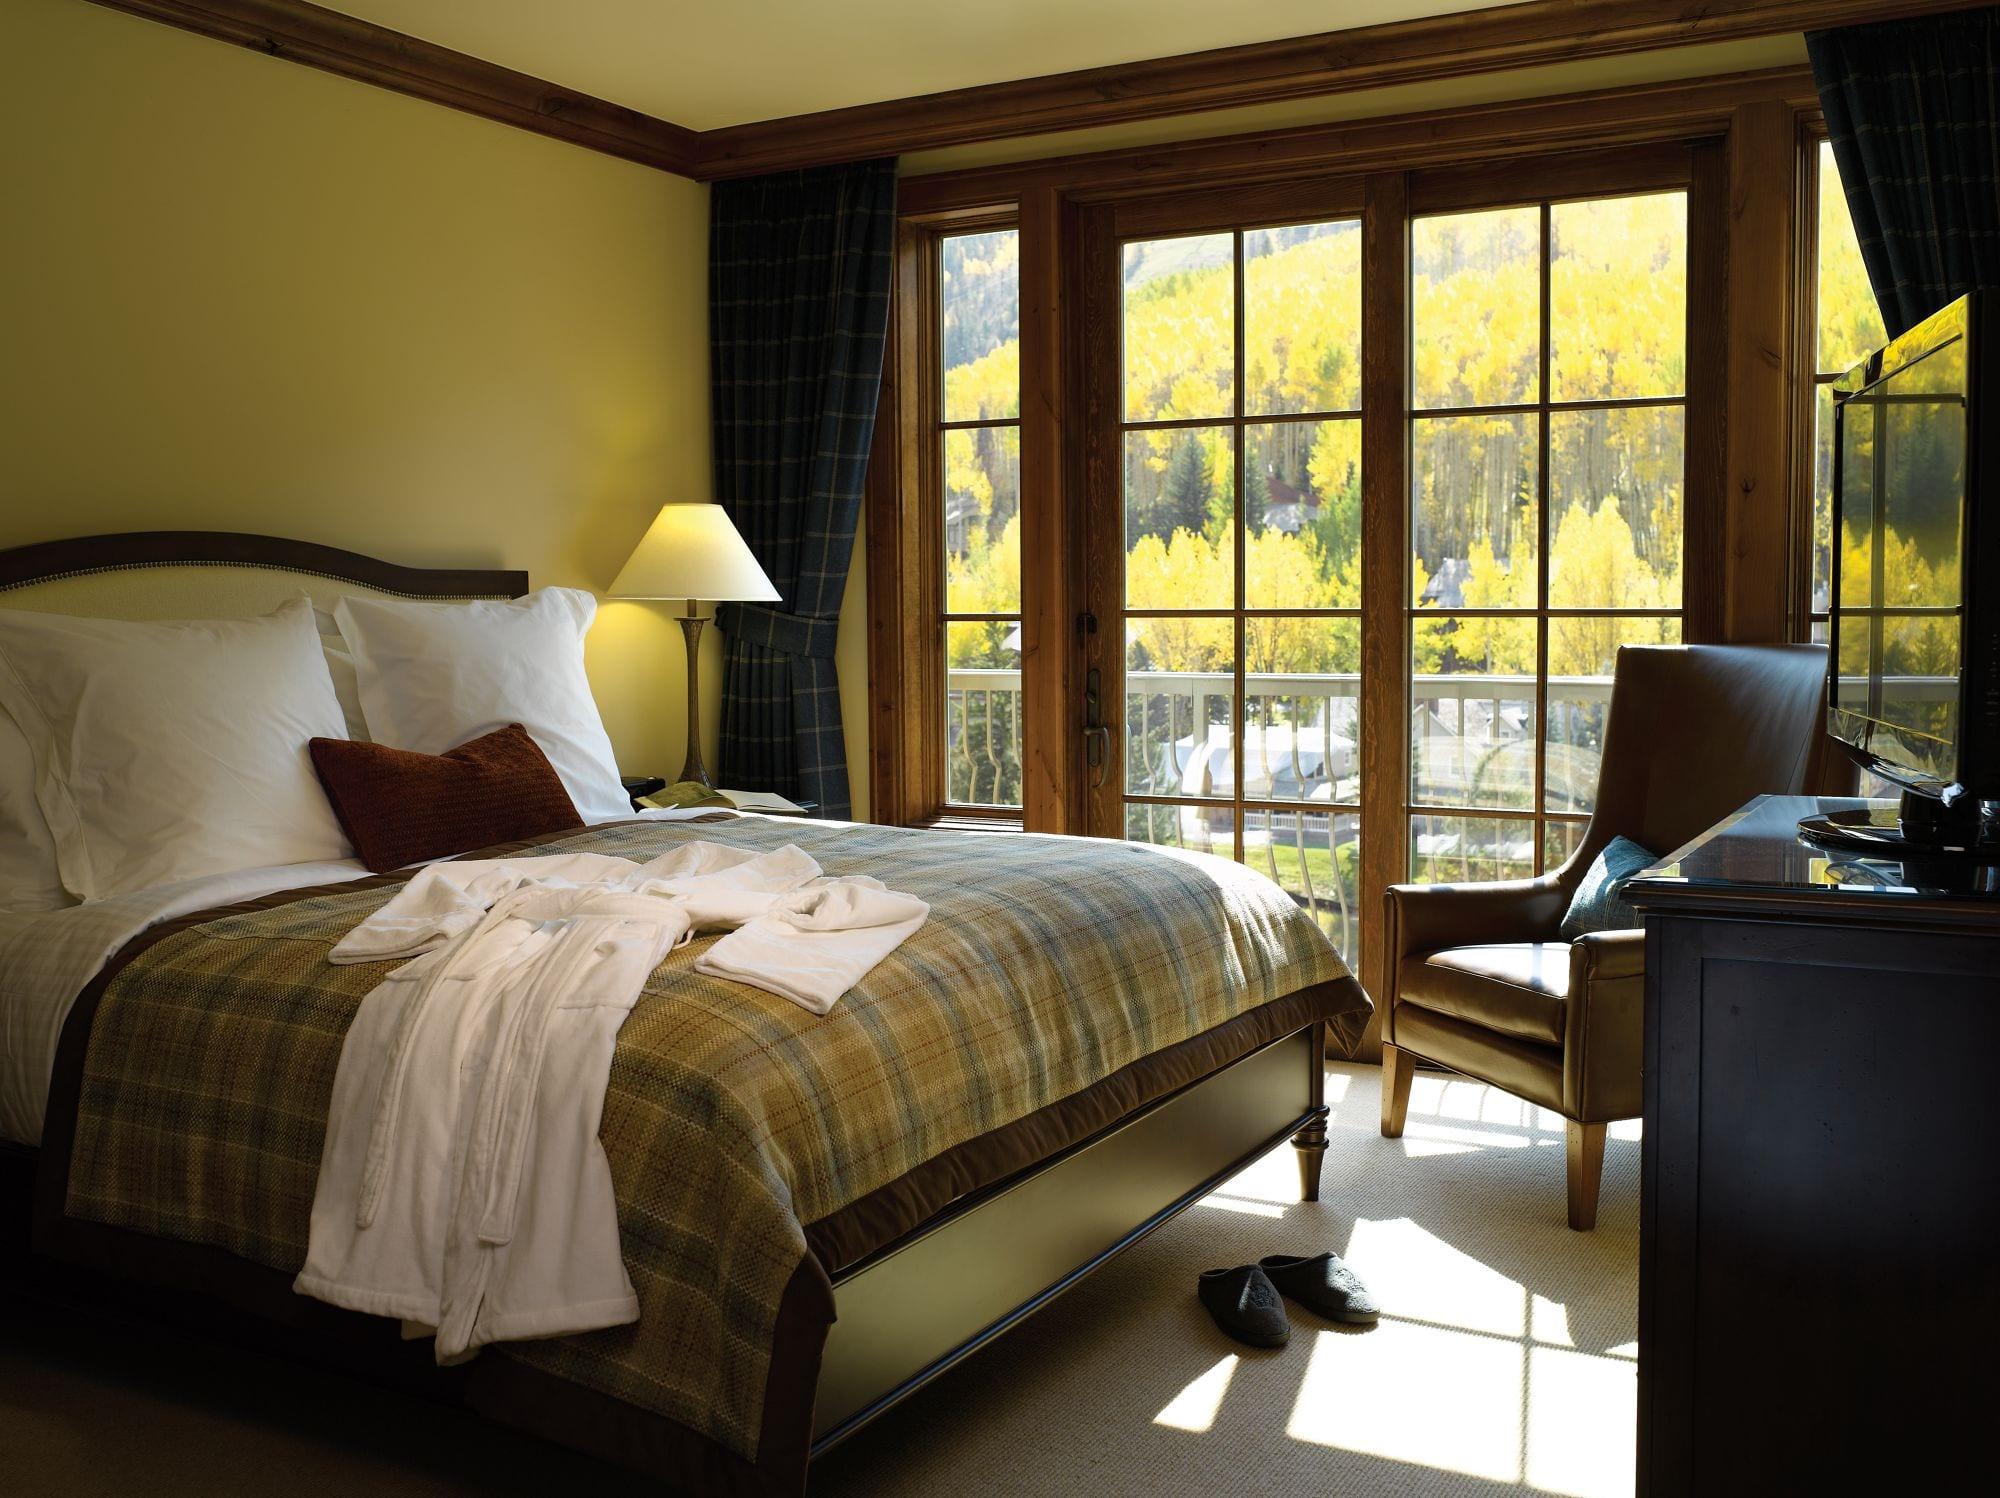 Room at The Ritz Carlton Club, Vail.